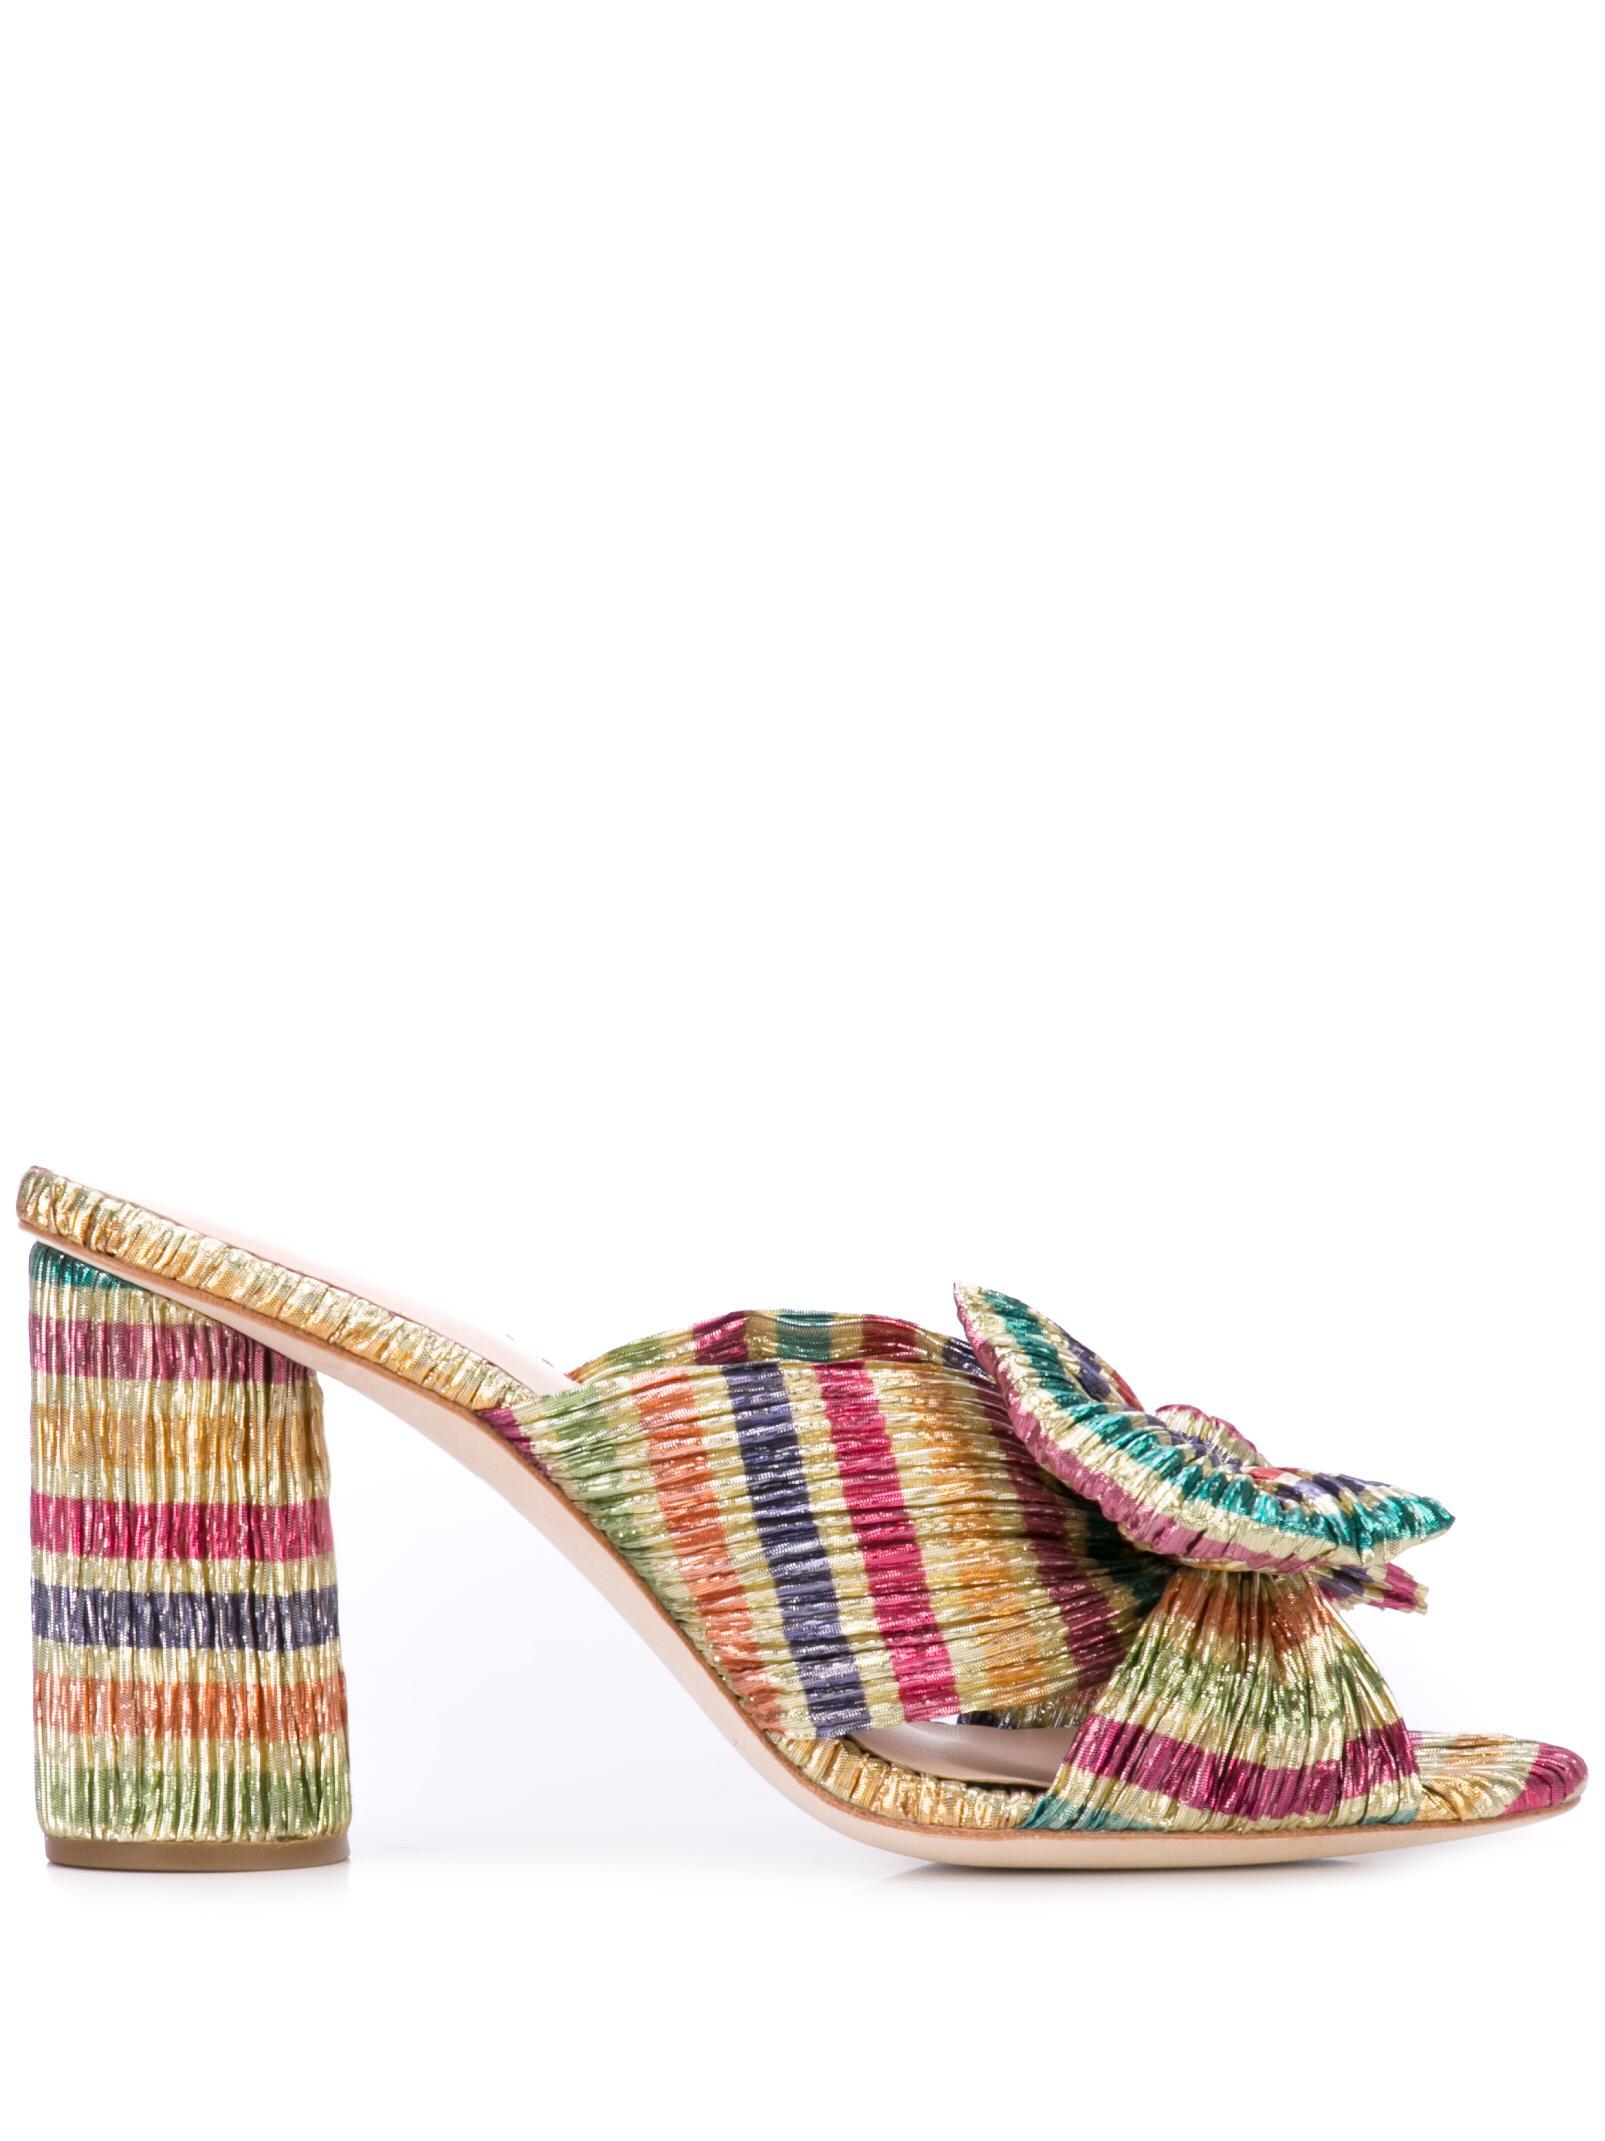 Stripe Knot High Heel Mule Sandal